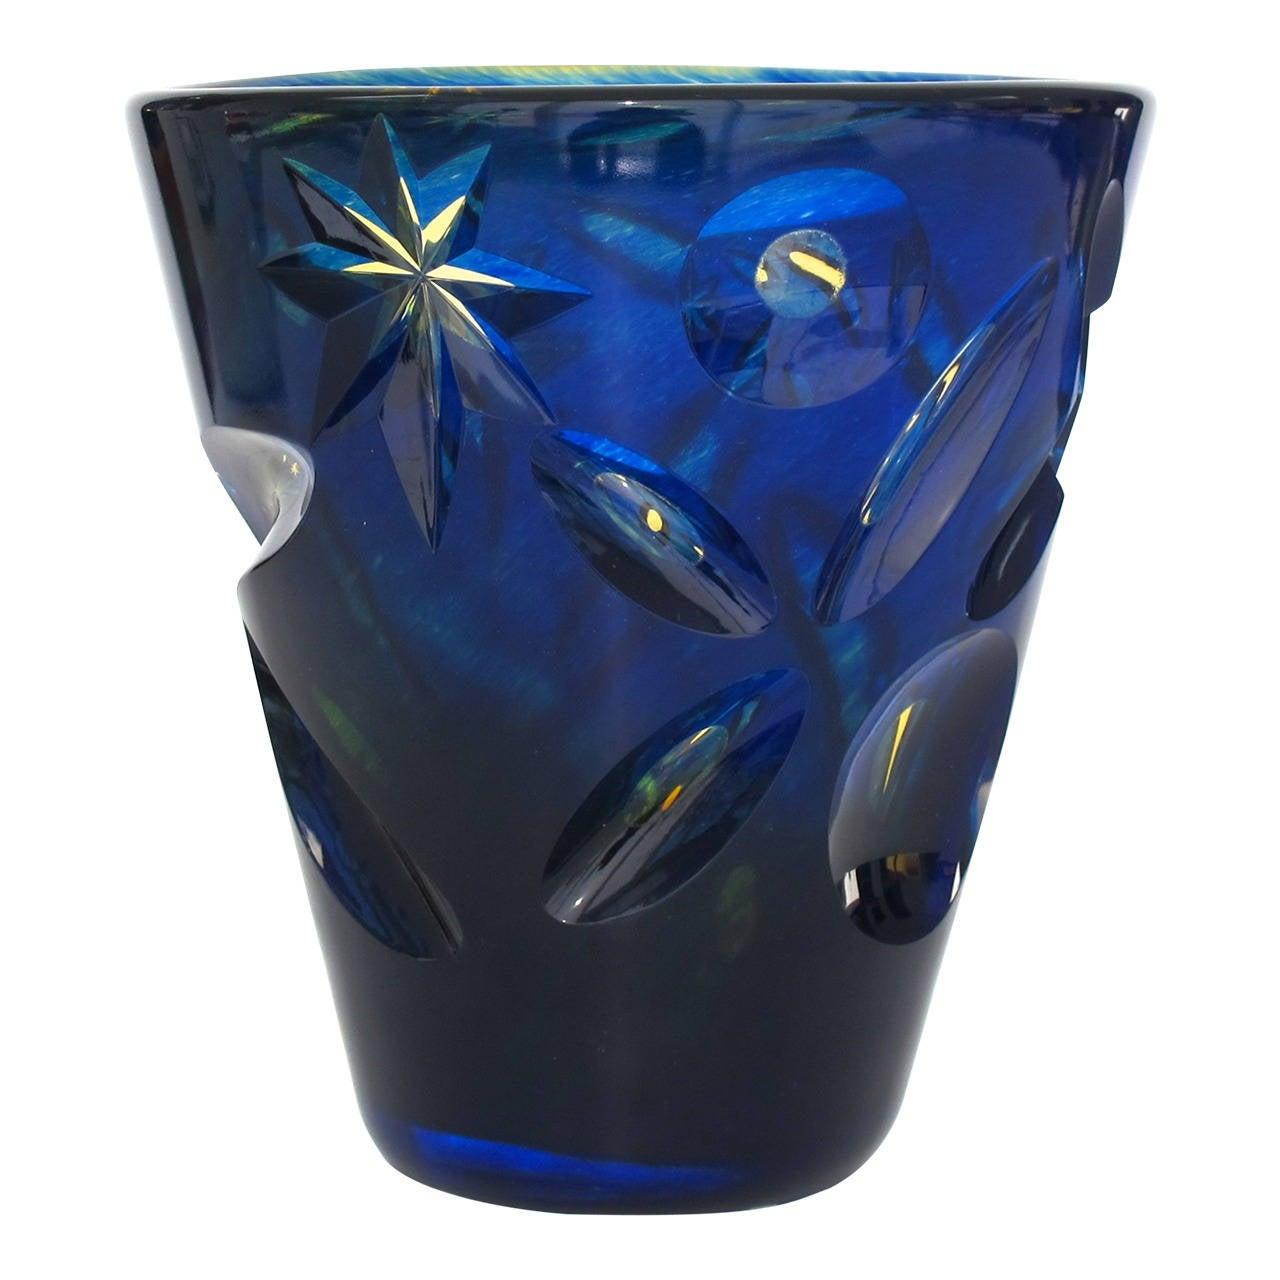 Göran Wärff Modern Art Glass Vase for Kosta Boda, Unica